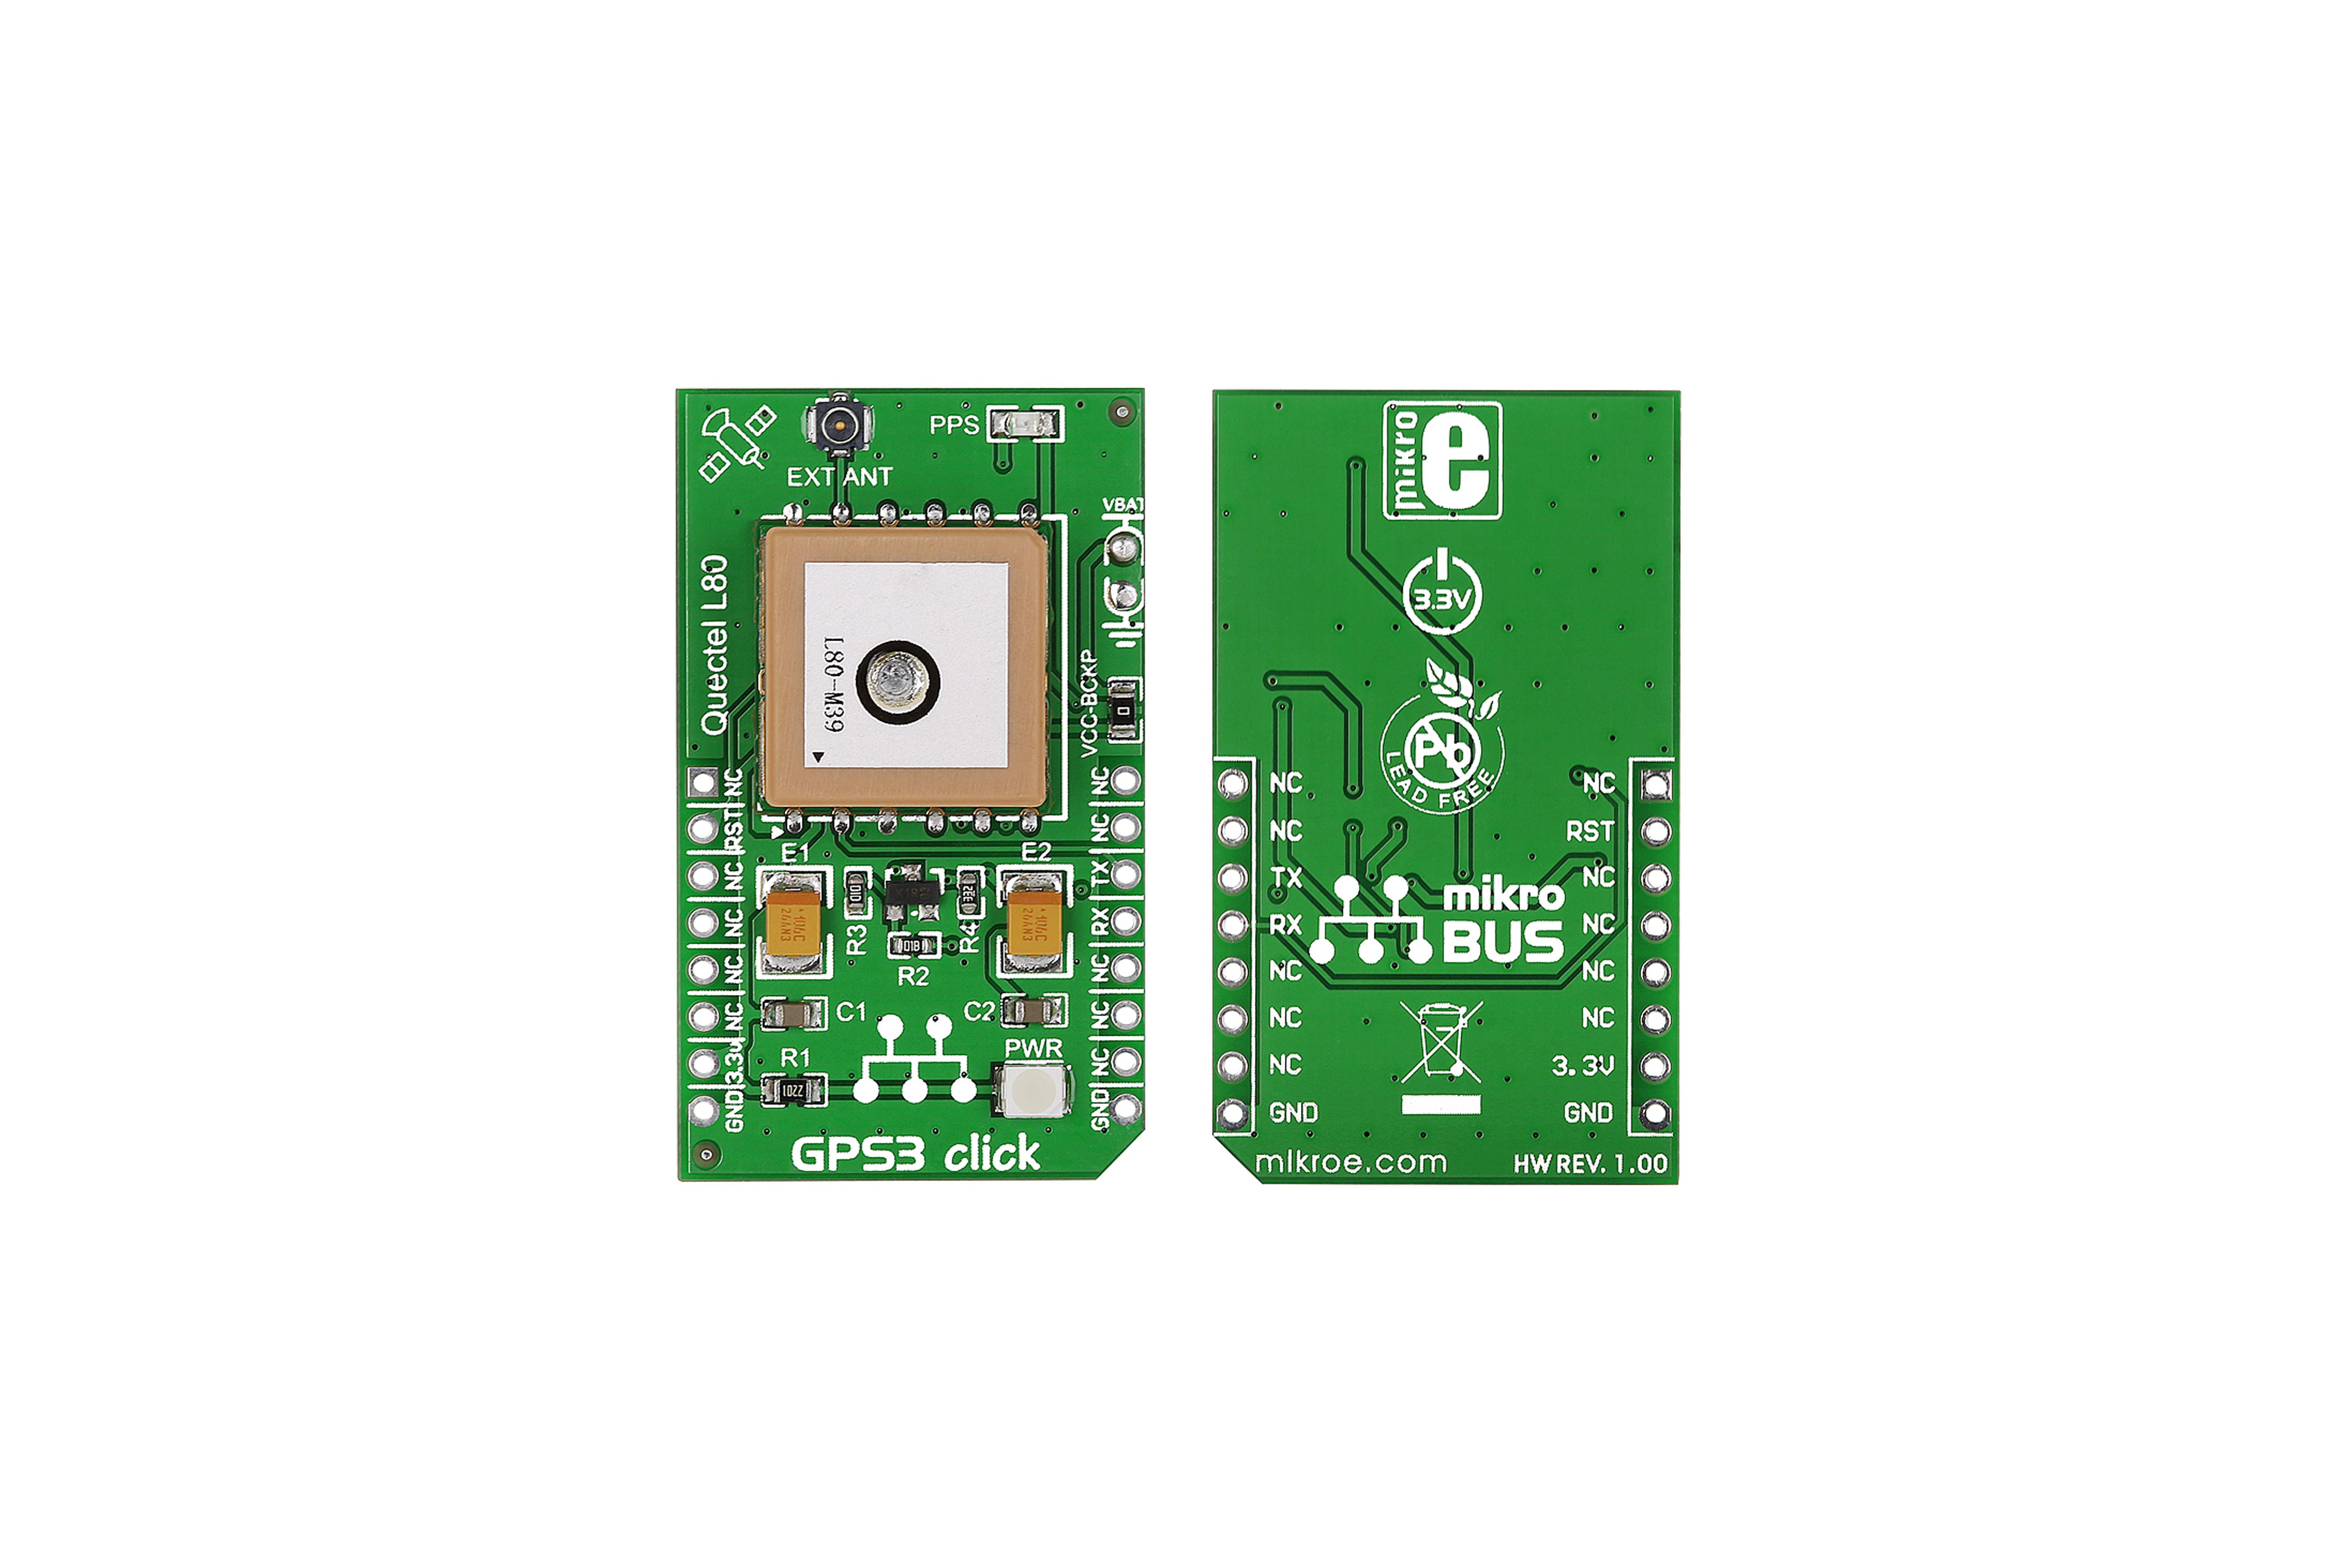 MikroElektronika GPS3 mikroBus Click Board per L80 GPS